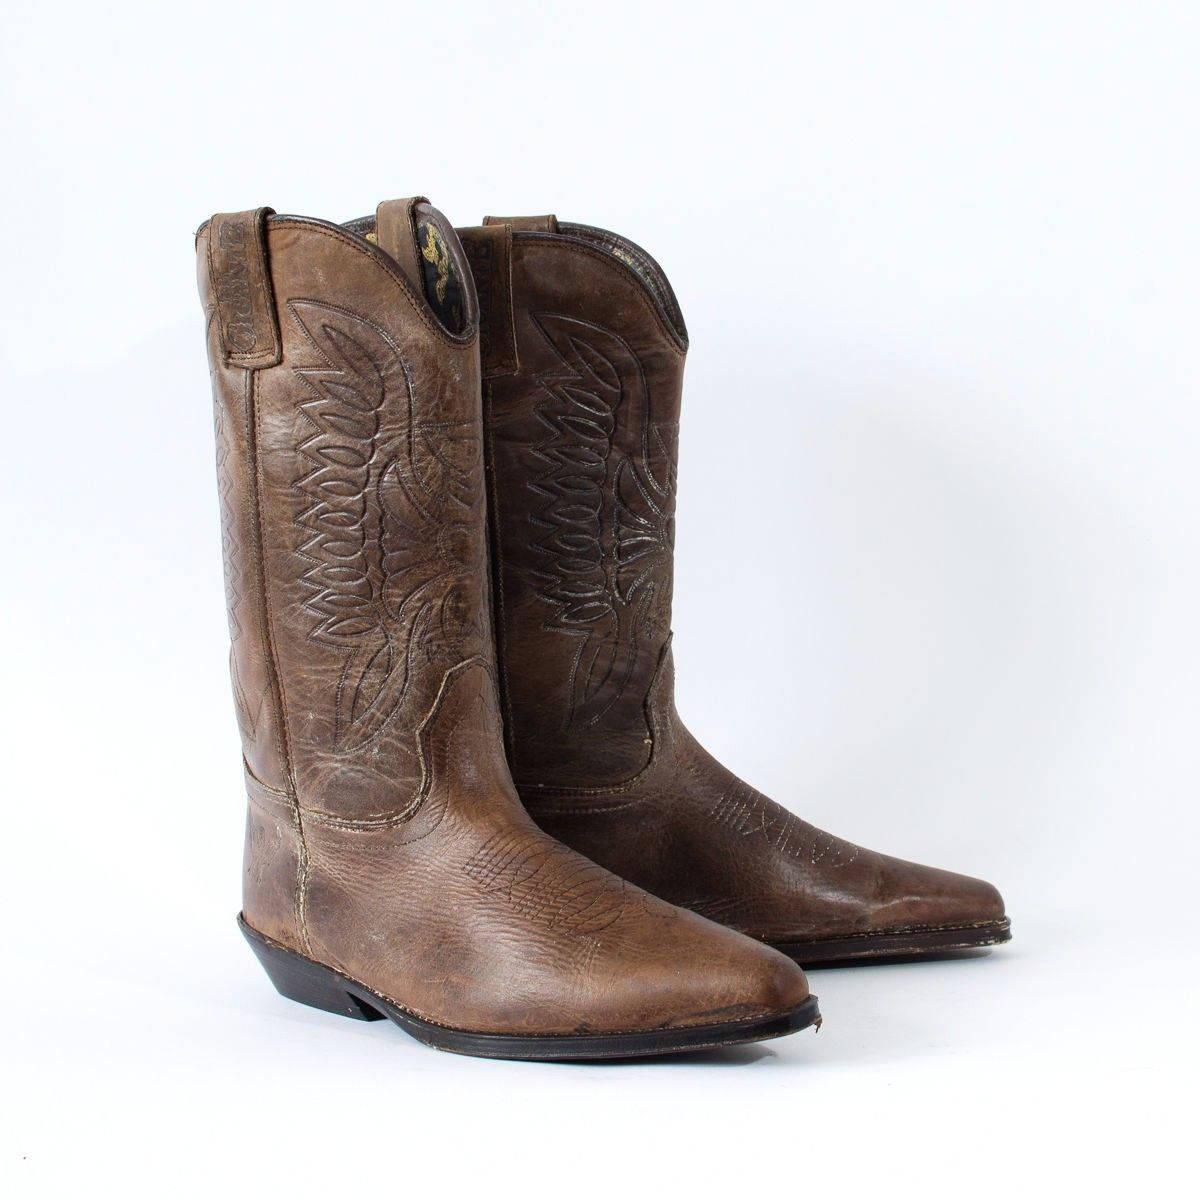 Vintage Brown Real Leather Cowboy Boots Festival Mens UK 8 EU 42 US 9